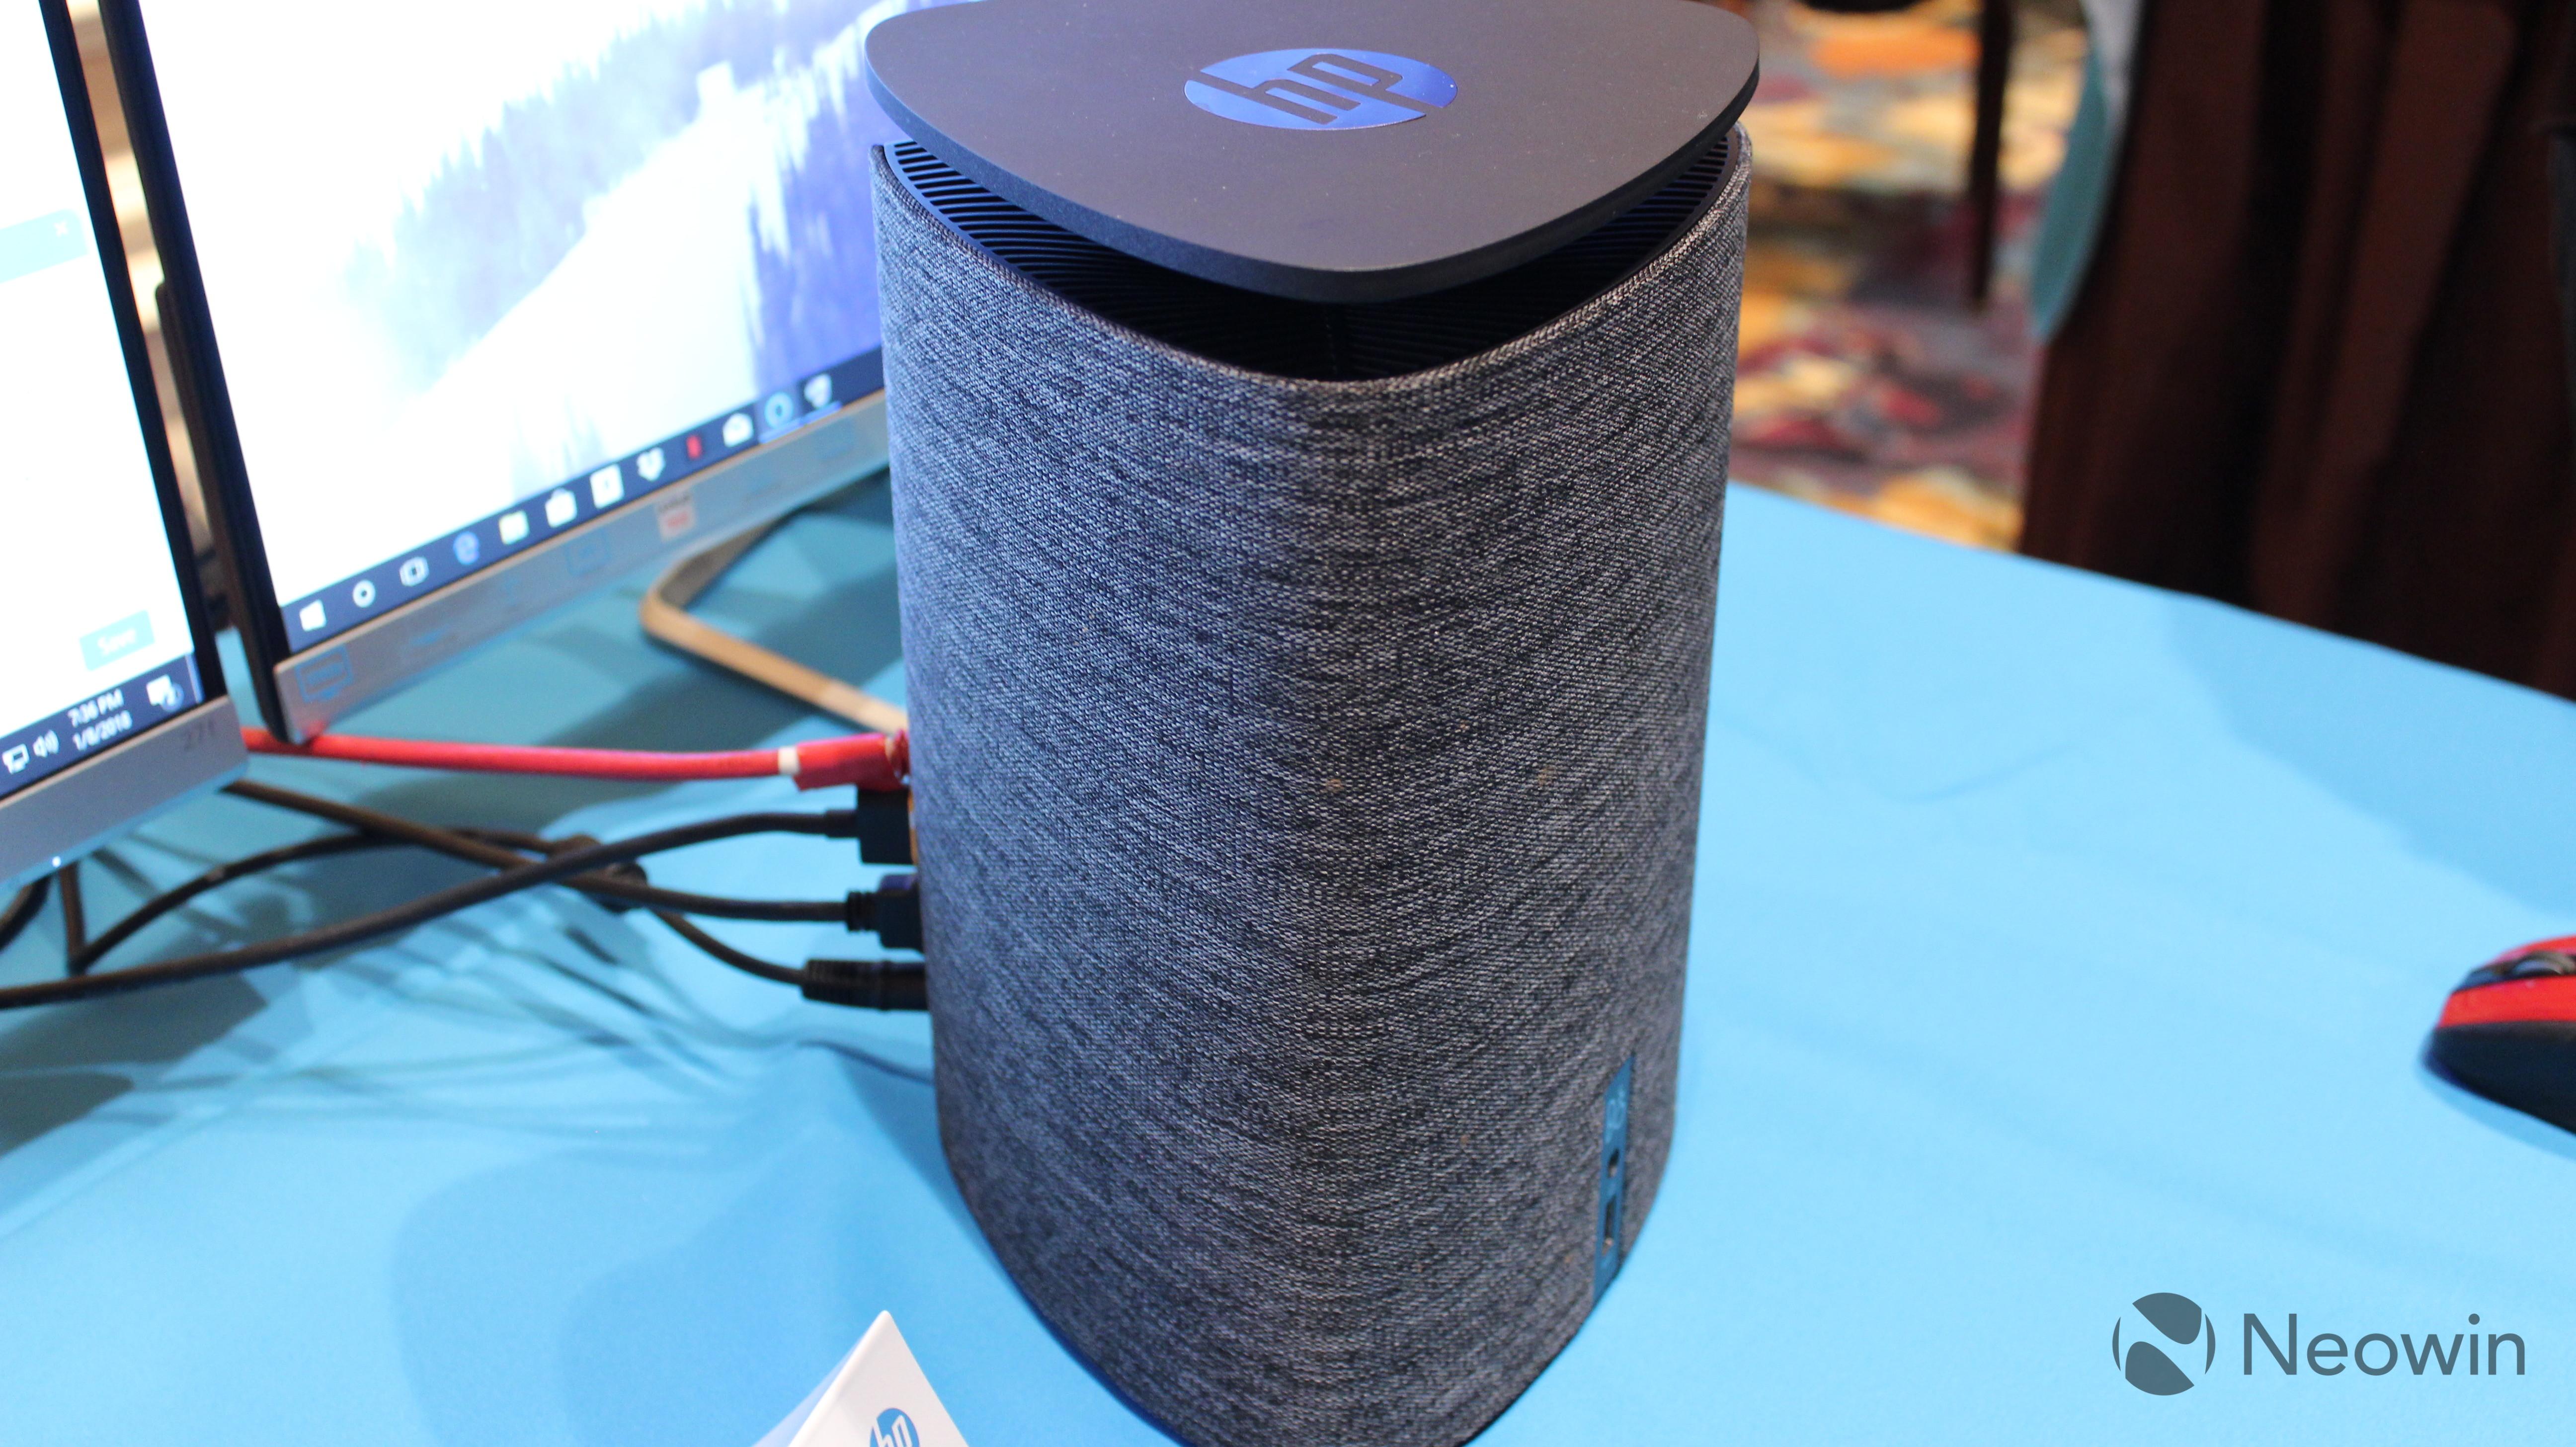 Premium Klipsch Wireless Speakers To Support Amazon Alexa Connected Speaker APIs